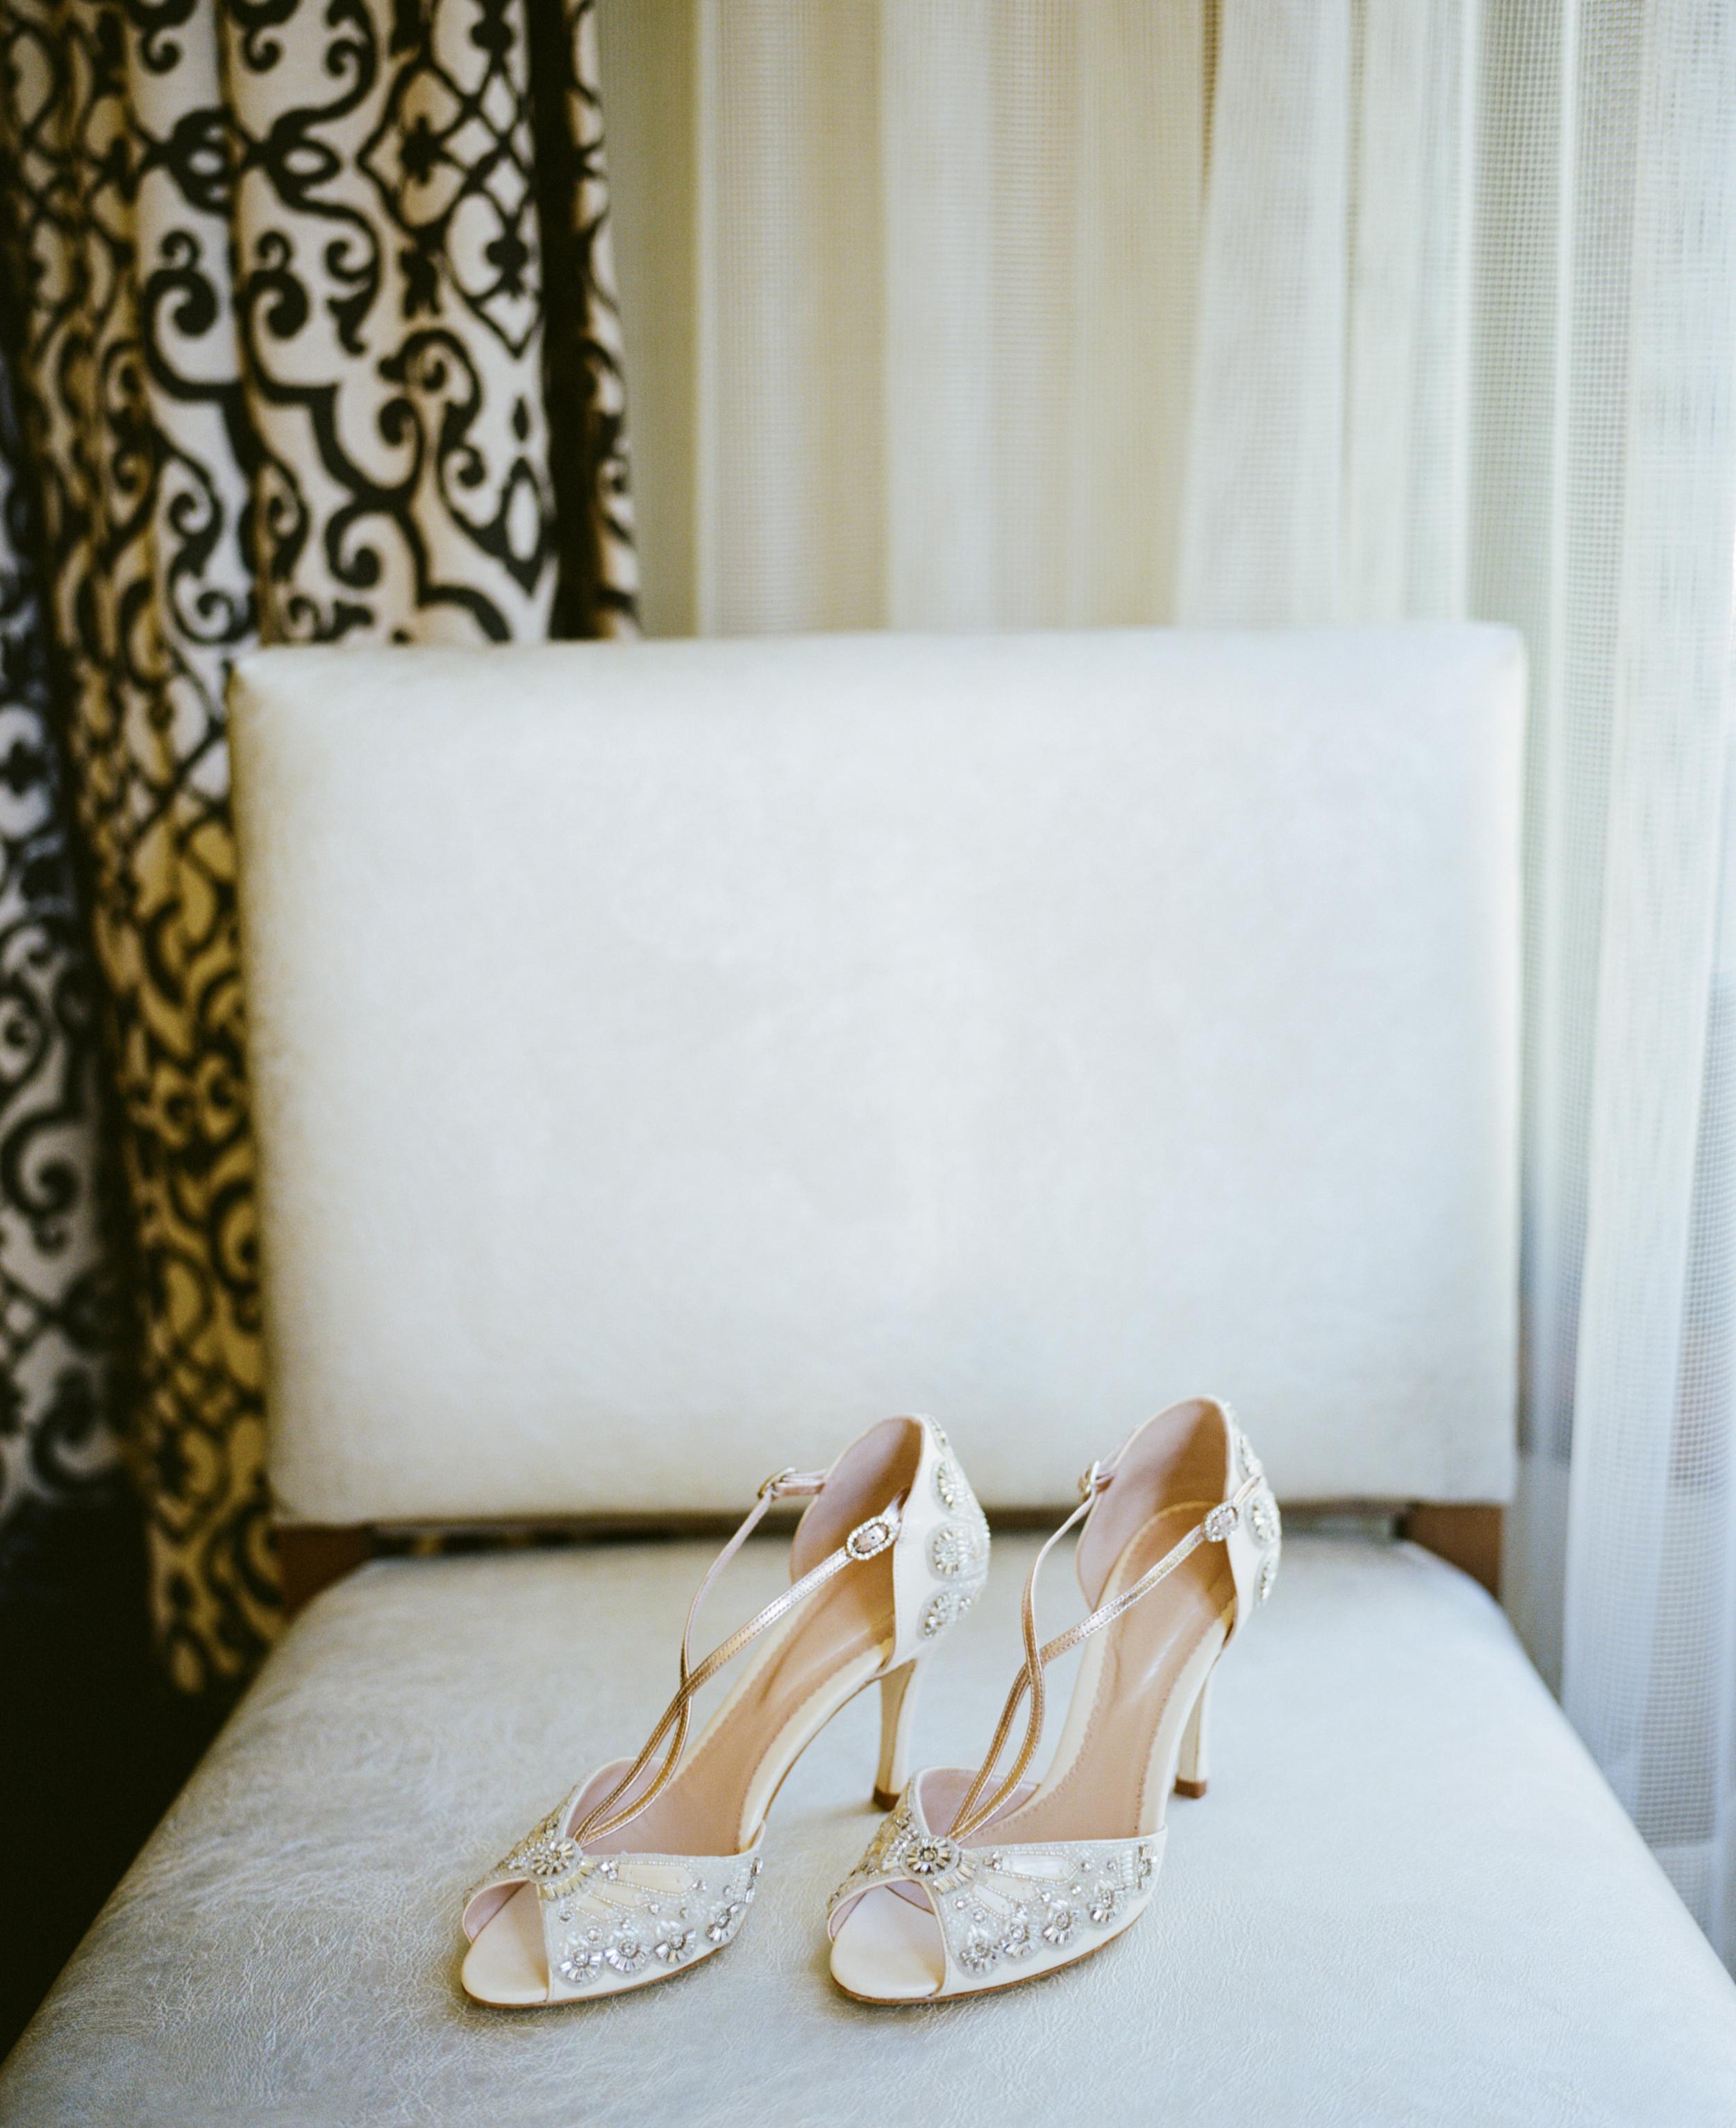 Kelly + Josh   Fall wedding at the Park Hyatt Beaver Creek   Emmy London shoes from Little White Dress   Ash Imagery